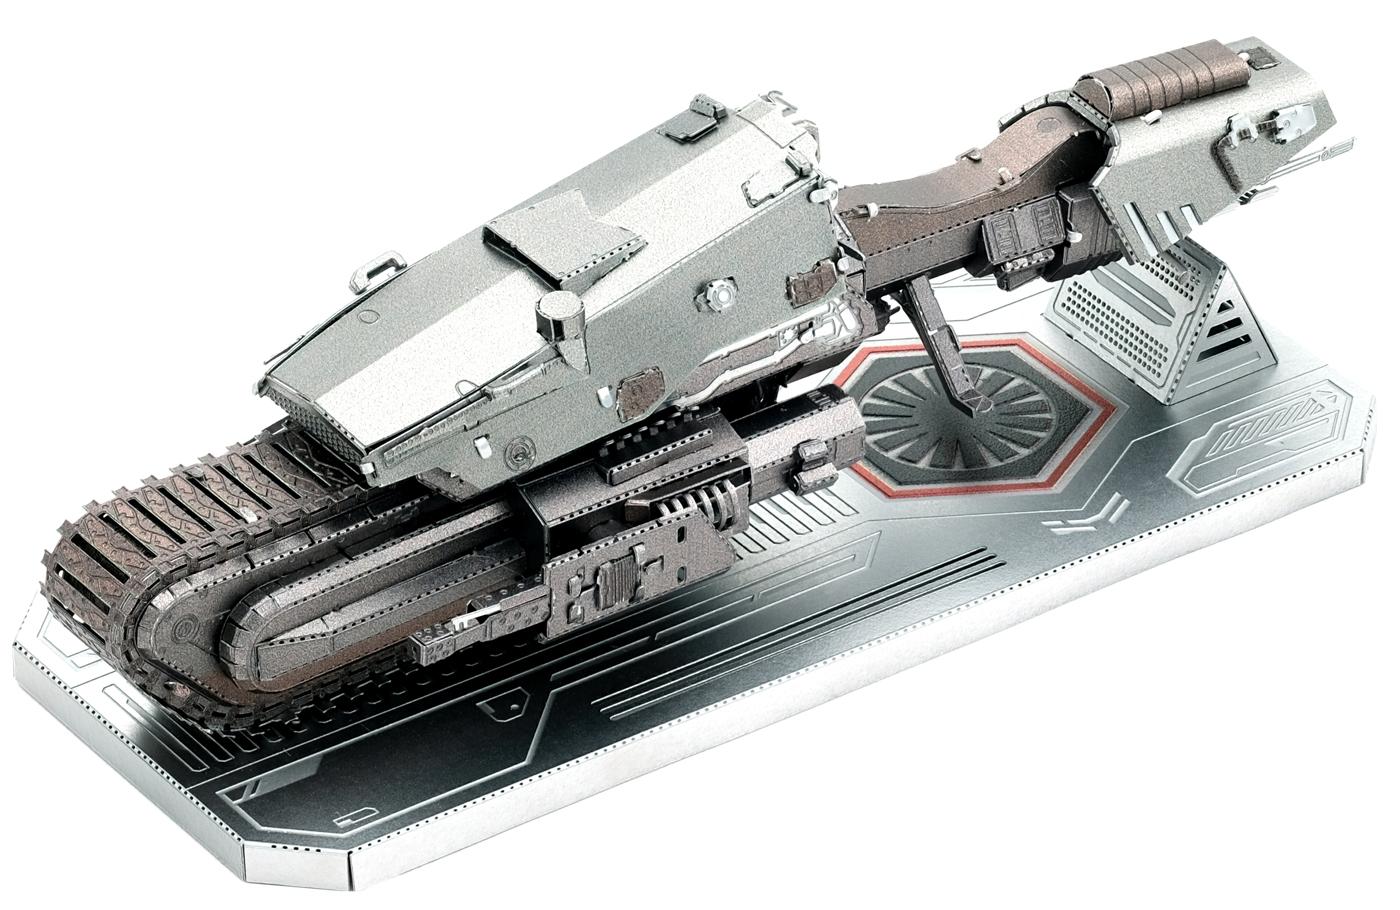 First Order Treadspeeder - Rise of Skywalker Star Wars Movies / Books / TV Metal Puzzles